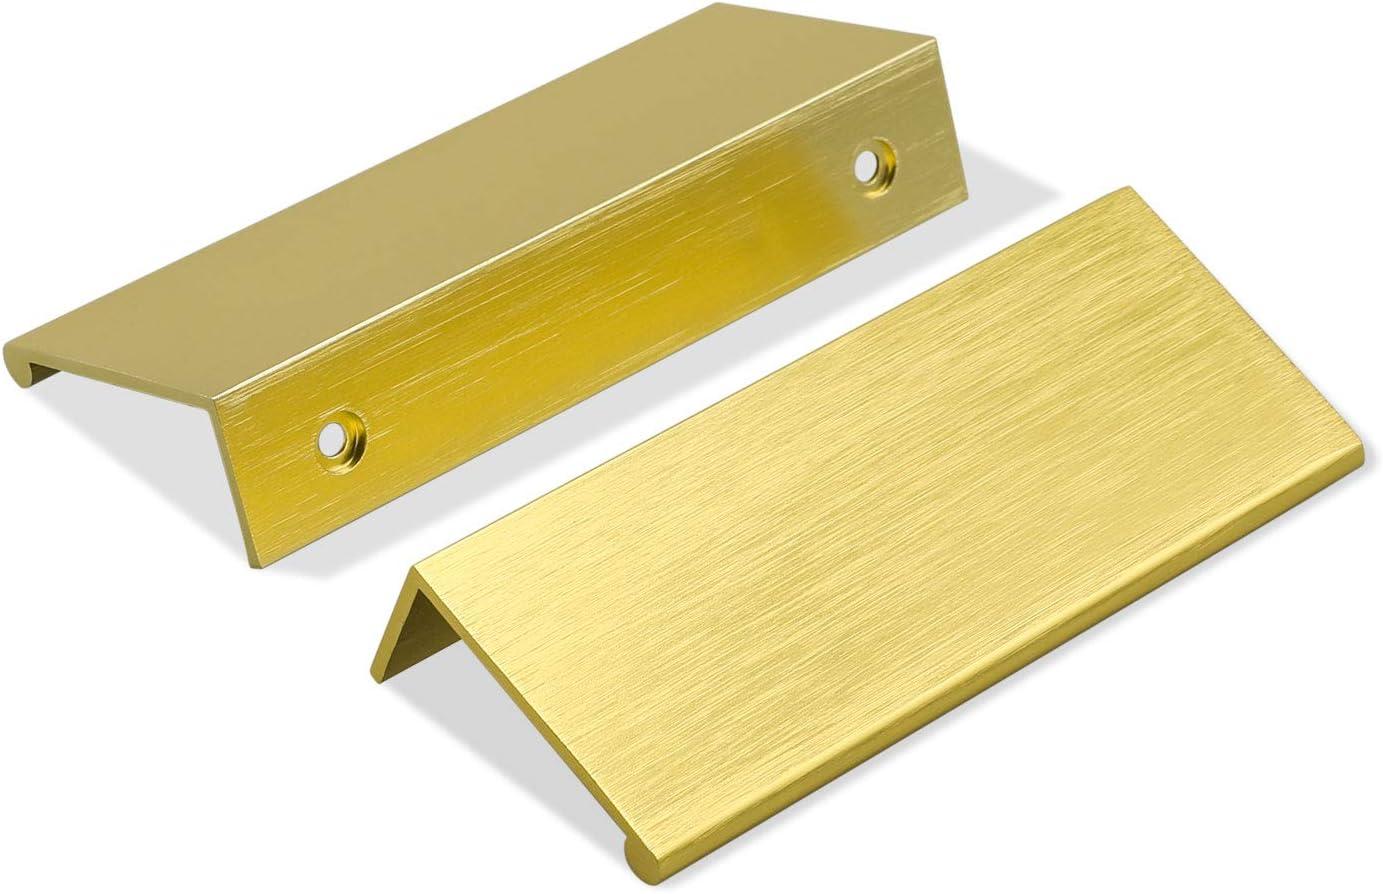 goldenwarm 5 Pack Gold Drawer Handles Brushed Brass Finger Pull 3inch Edge Pulls Cabinet Hardware - LS7030GD Modern Concealed Kitchen Handle Furniture Handware Aluminum Alloy